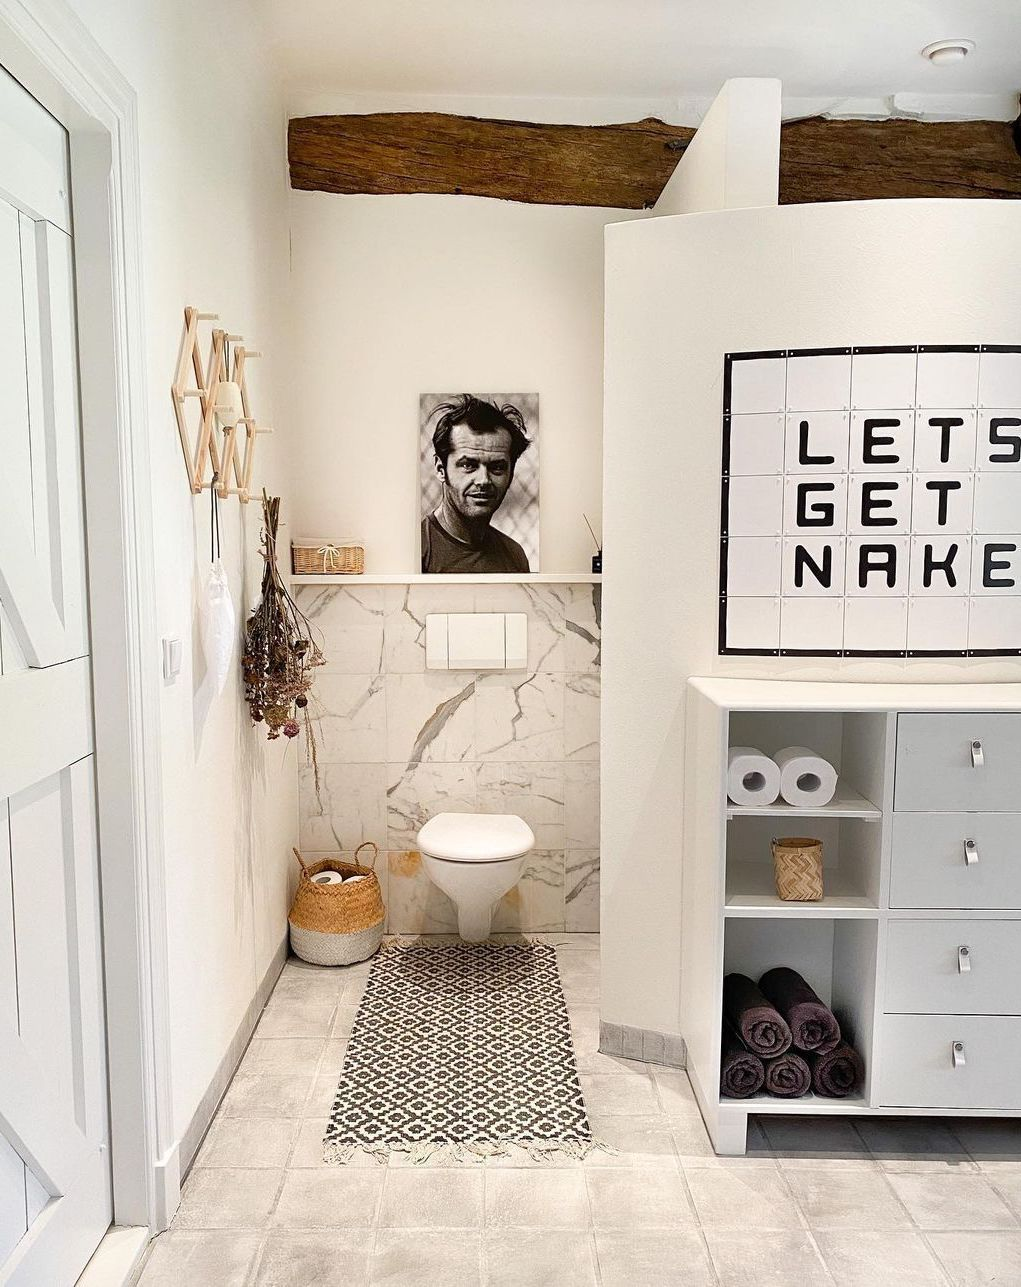 21 Modern Scandinavian Bathroom Decor Ideas In 2021 Modern Scandinavian Bathroom Scandinavian Bathroom Latest Bathroom Designs